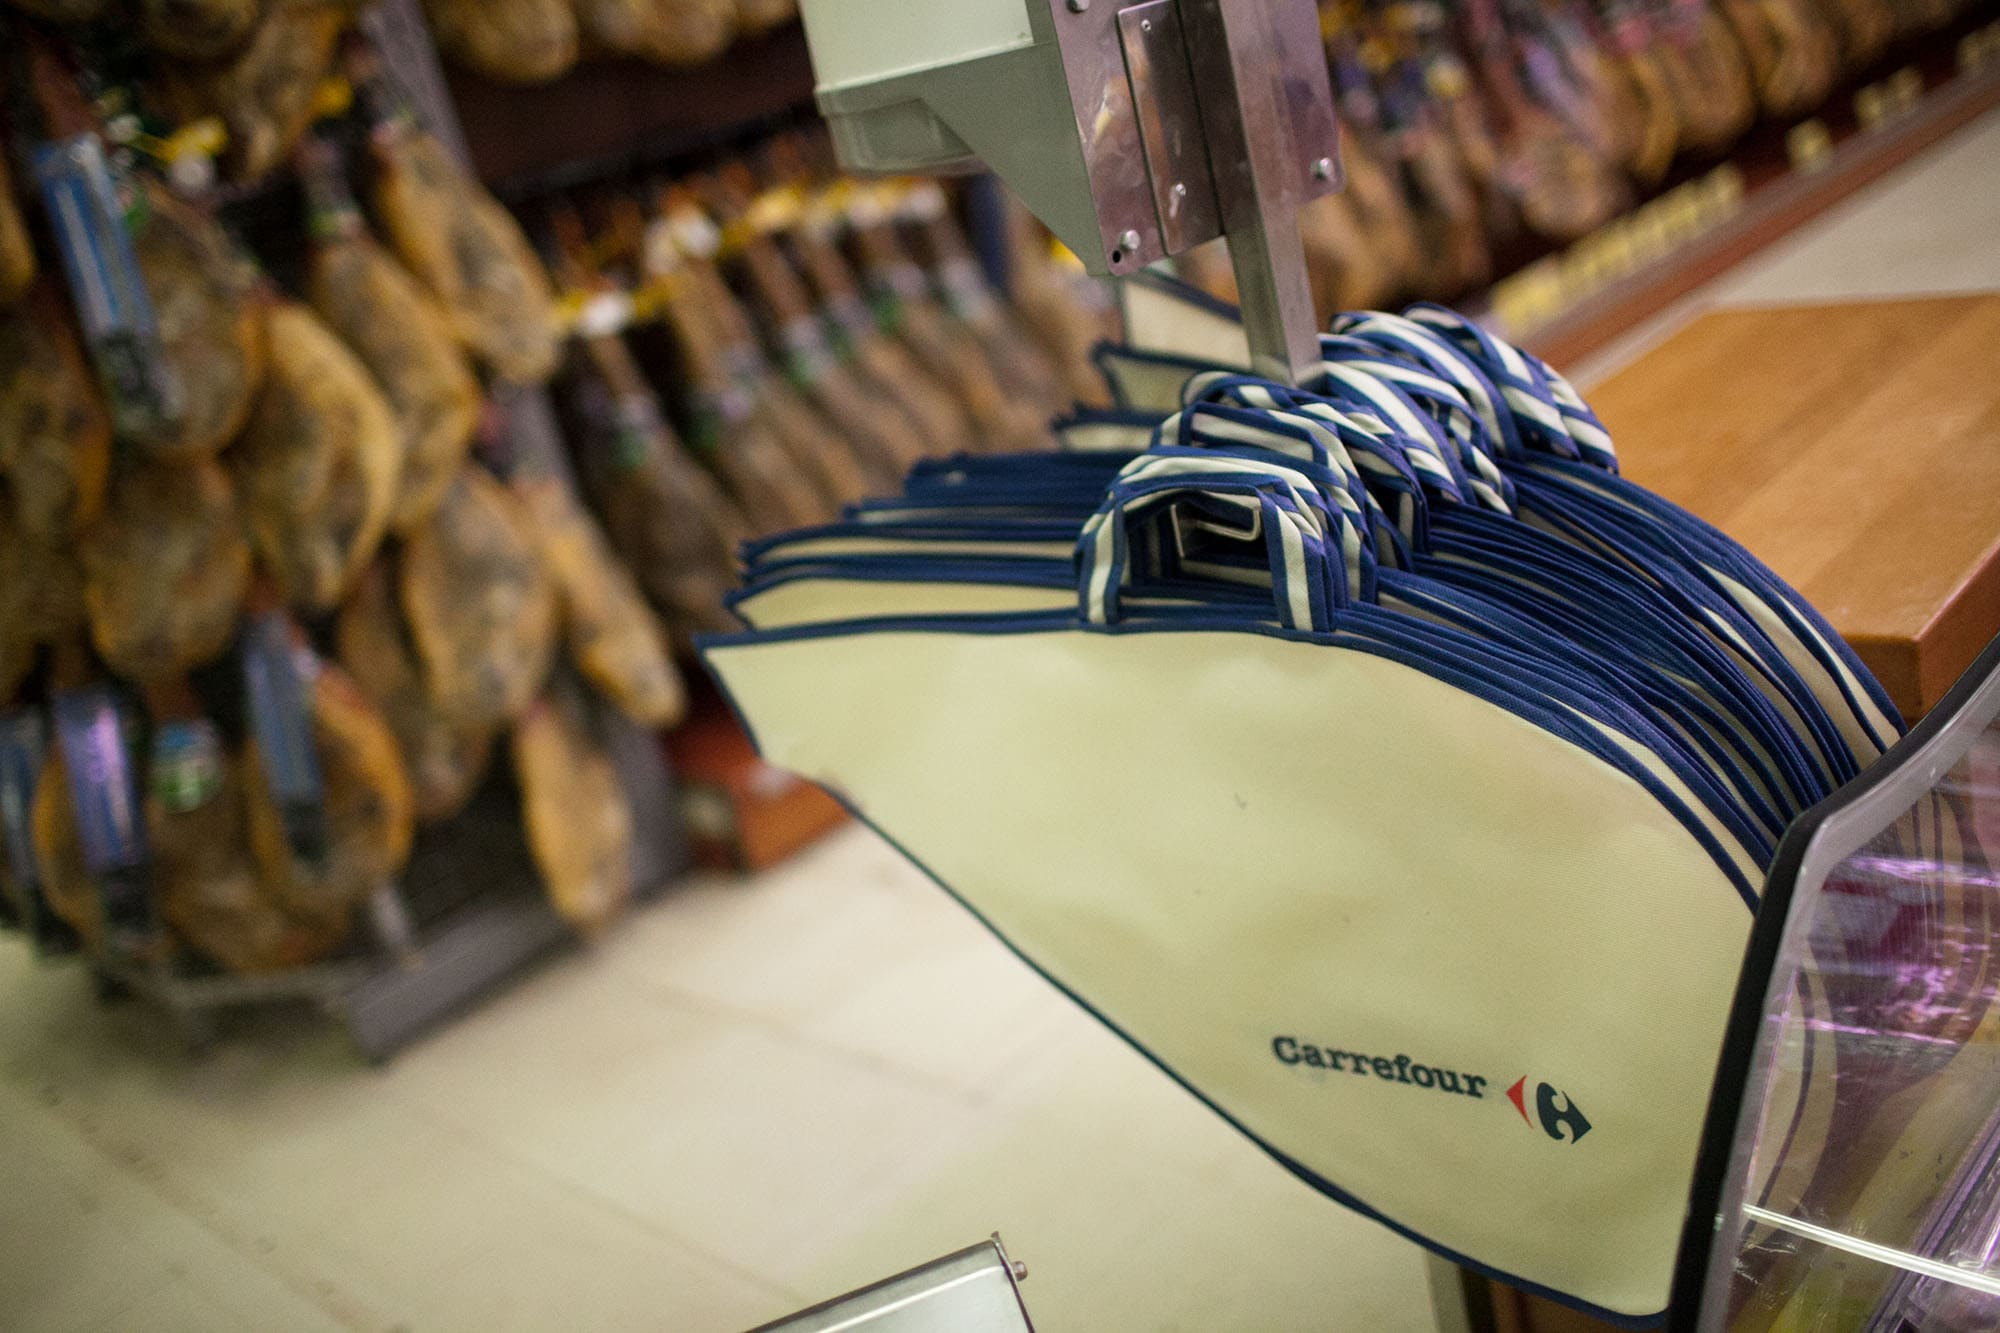 Carrefour in Valencia, Spain